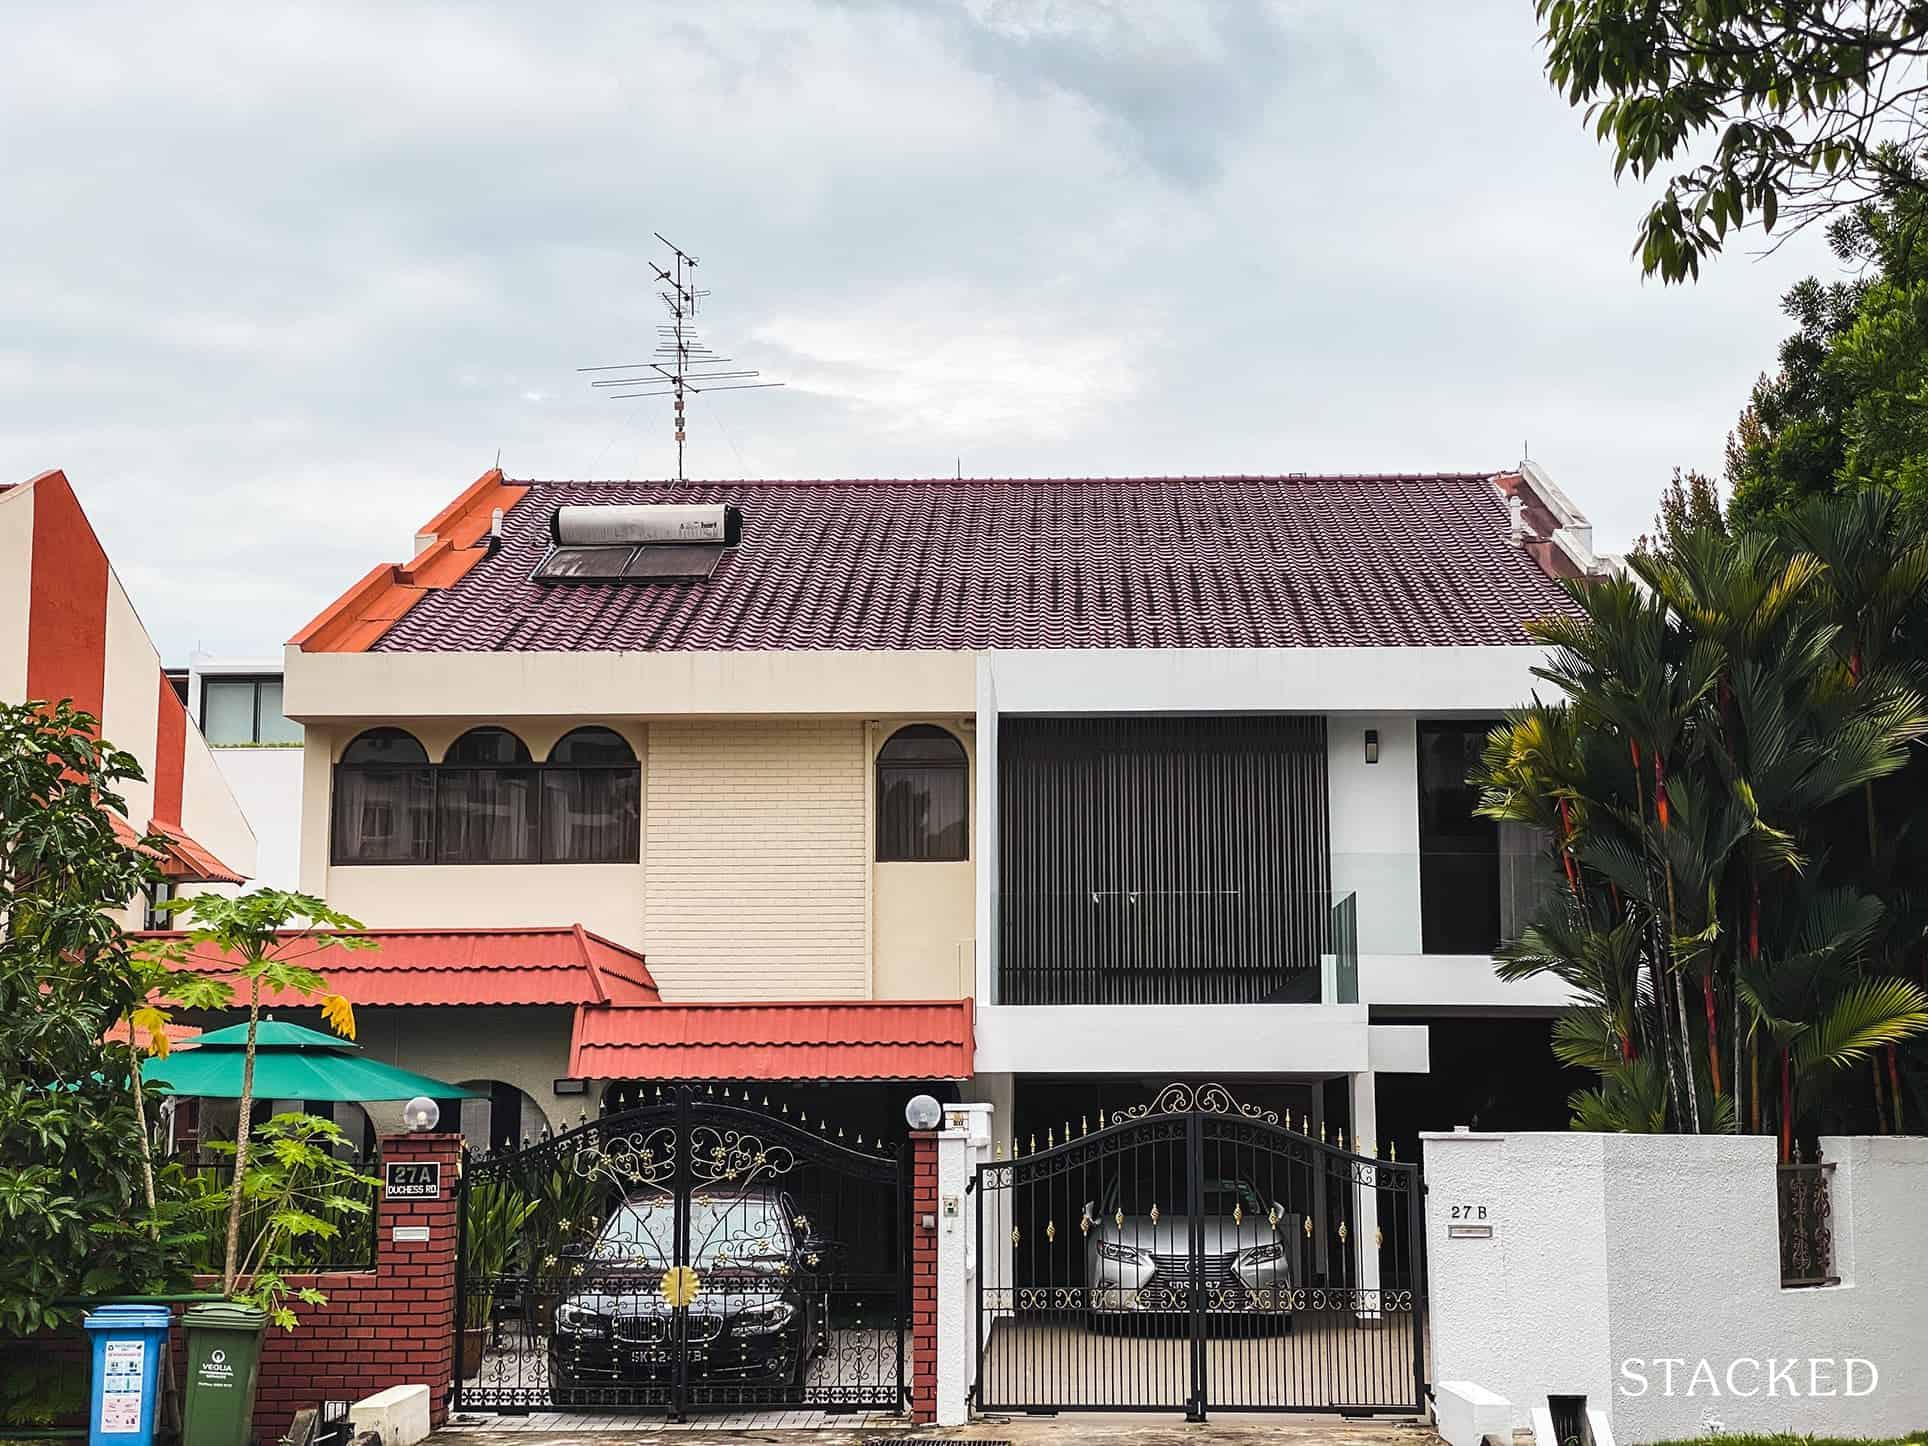 Neighbourhood Of The Week: Bukit Timah (District 21)